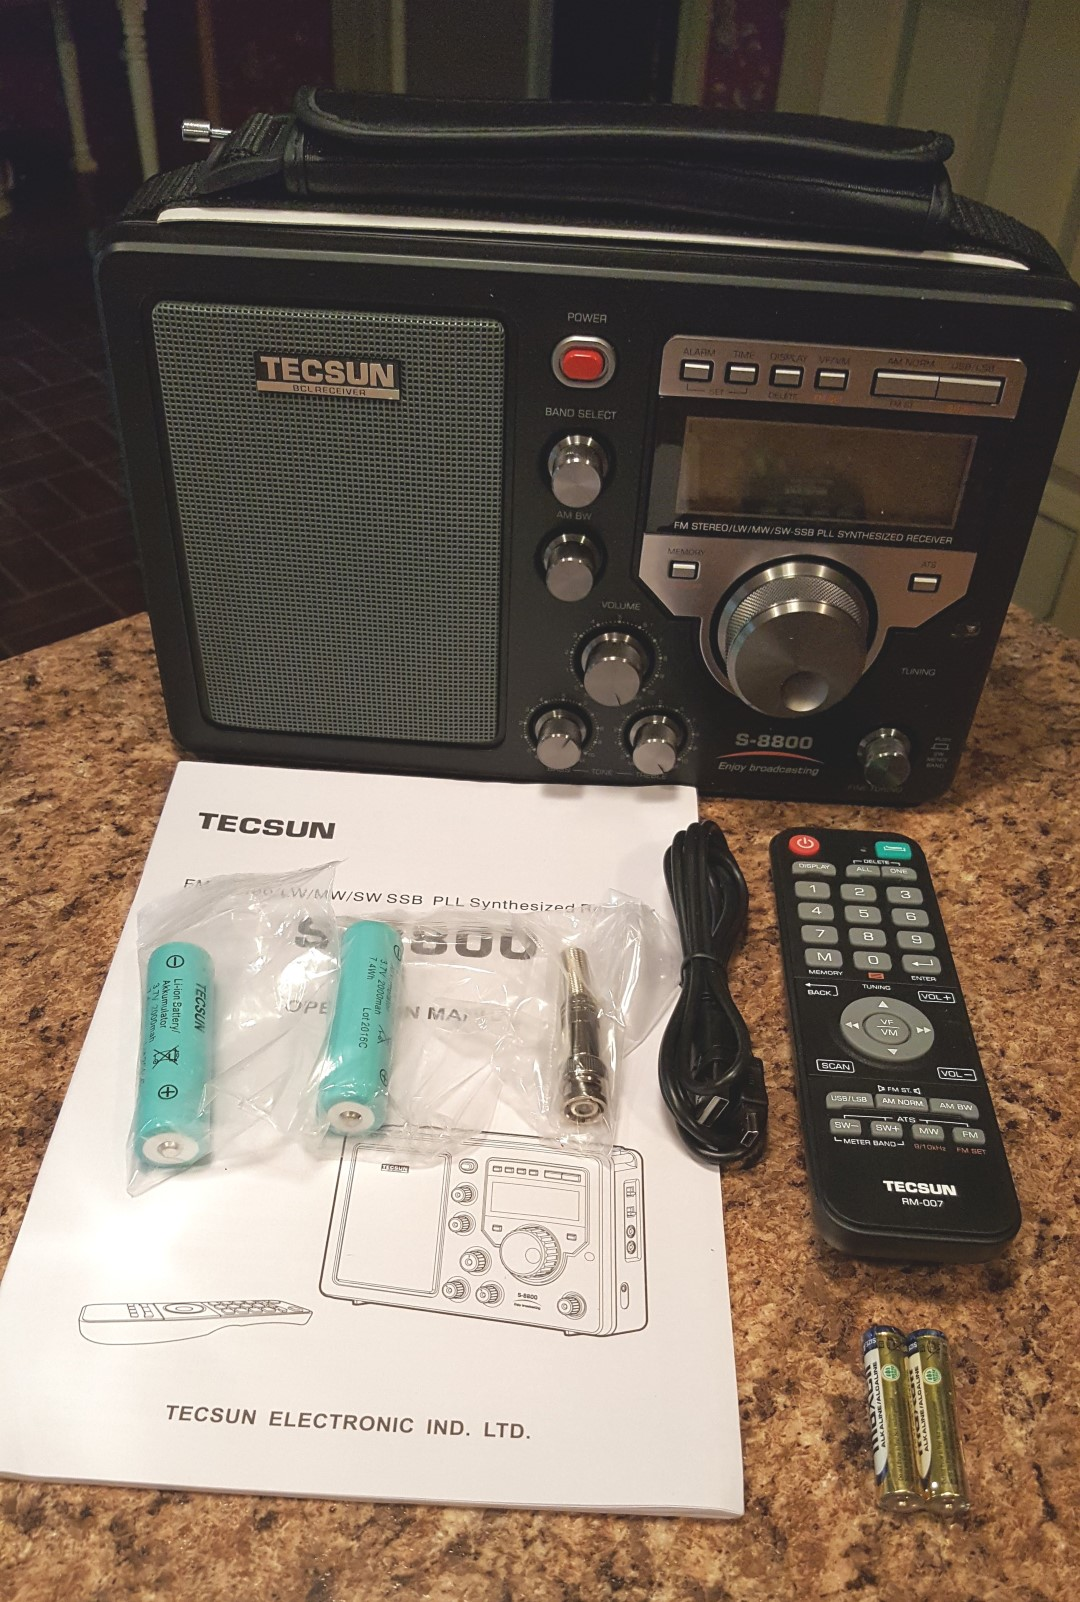 Tecsun S-8800 AM/LW/SW/FM Field Radio With Remote